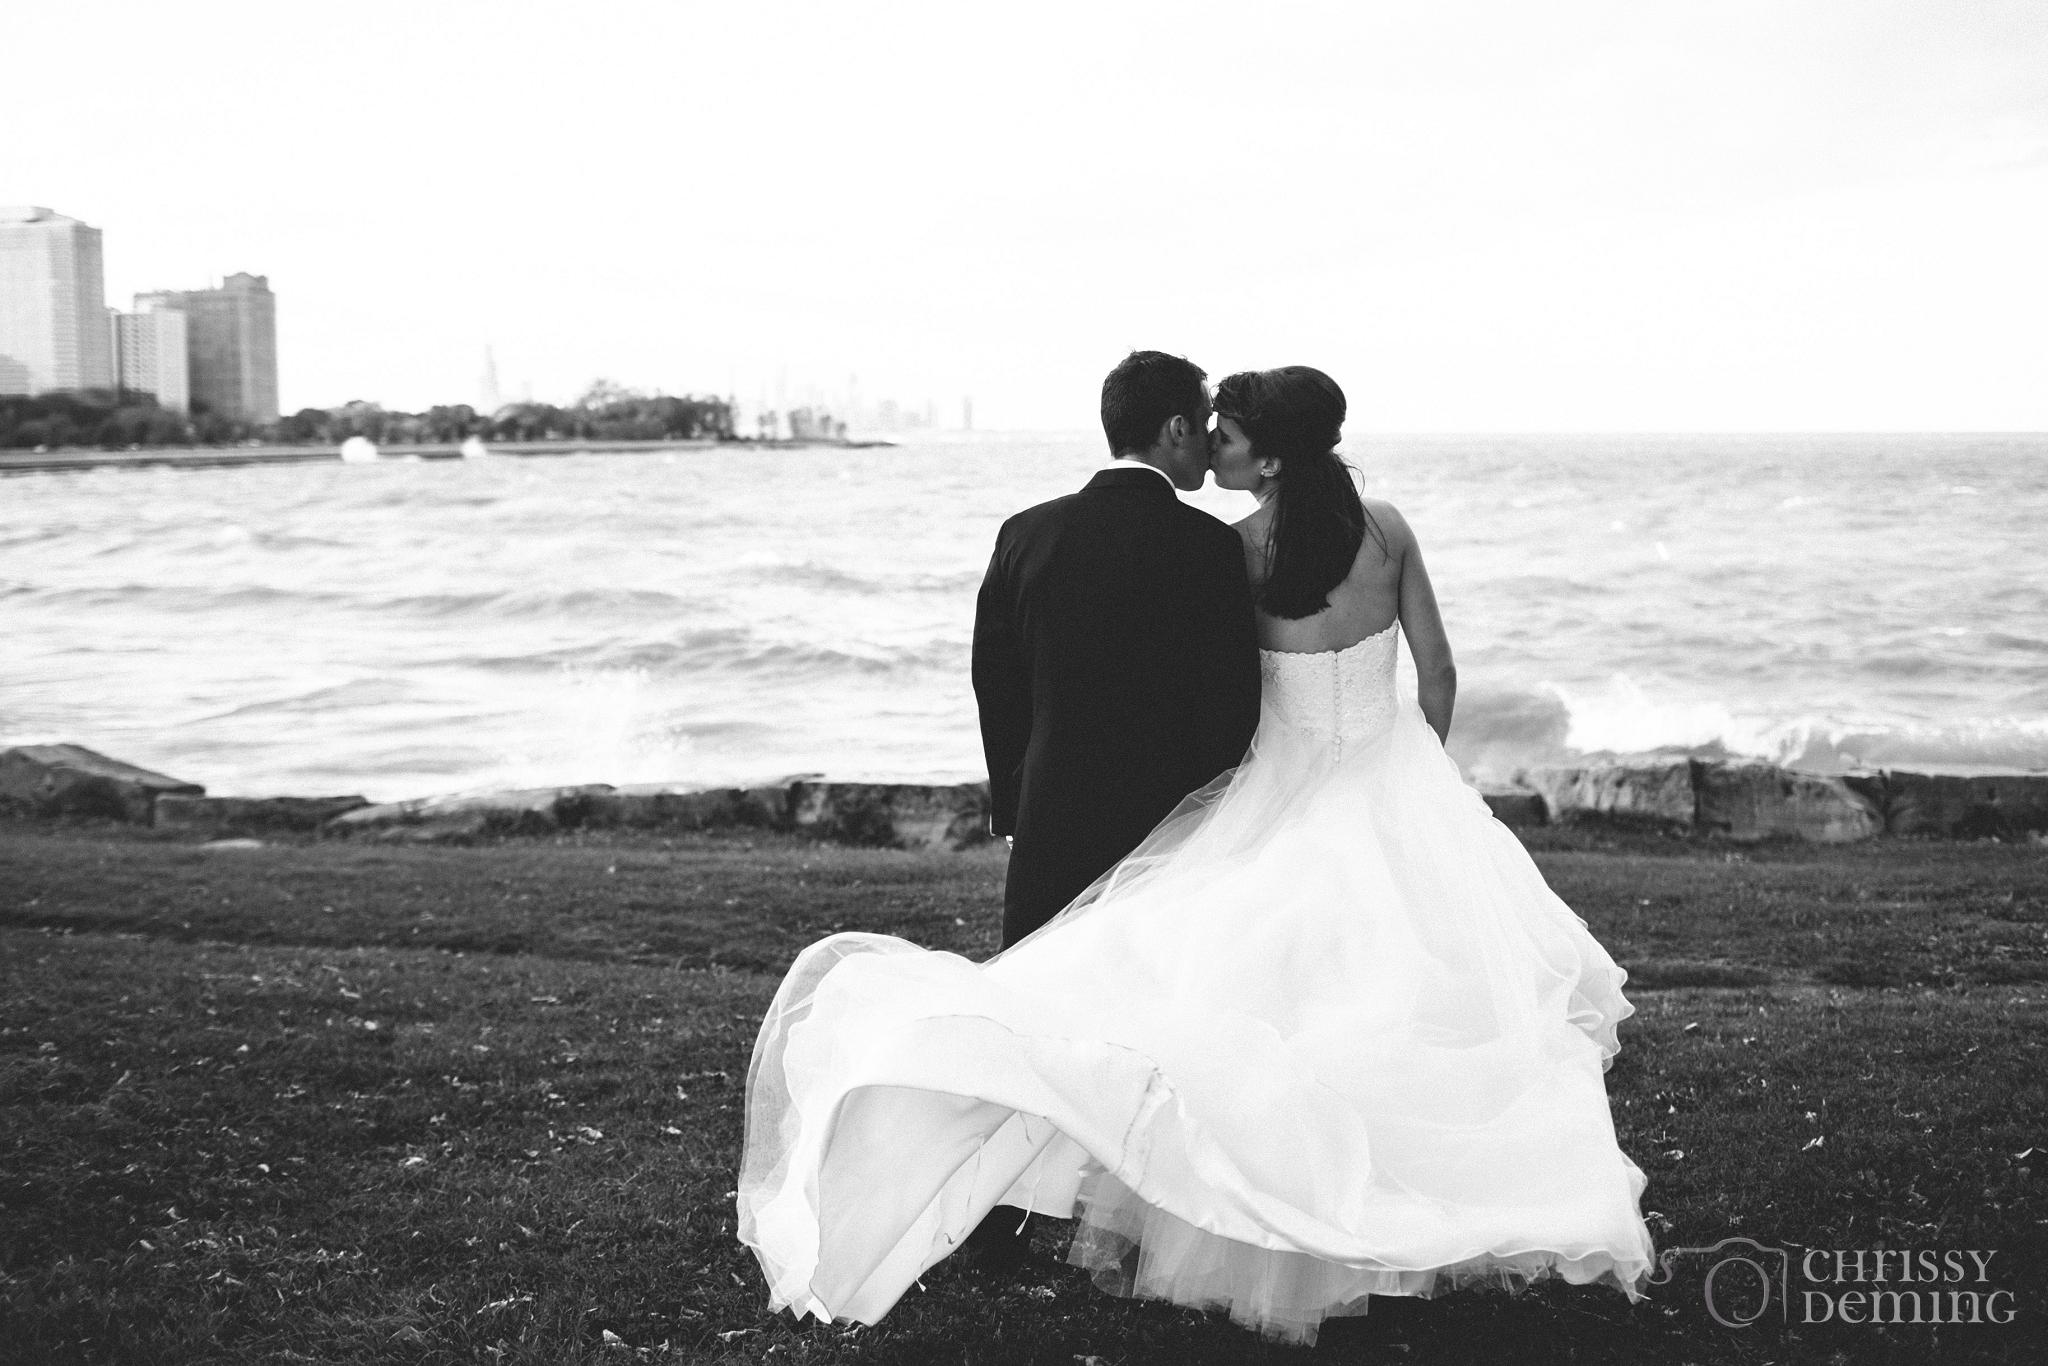 promontory_point_chicago_wedding_photography_0020.jpg